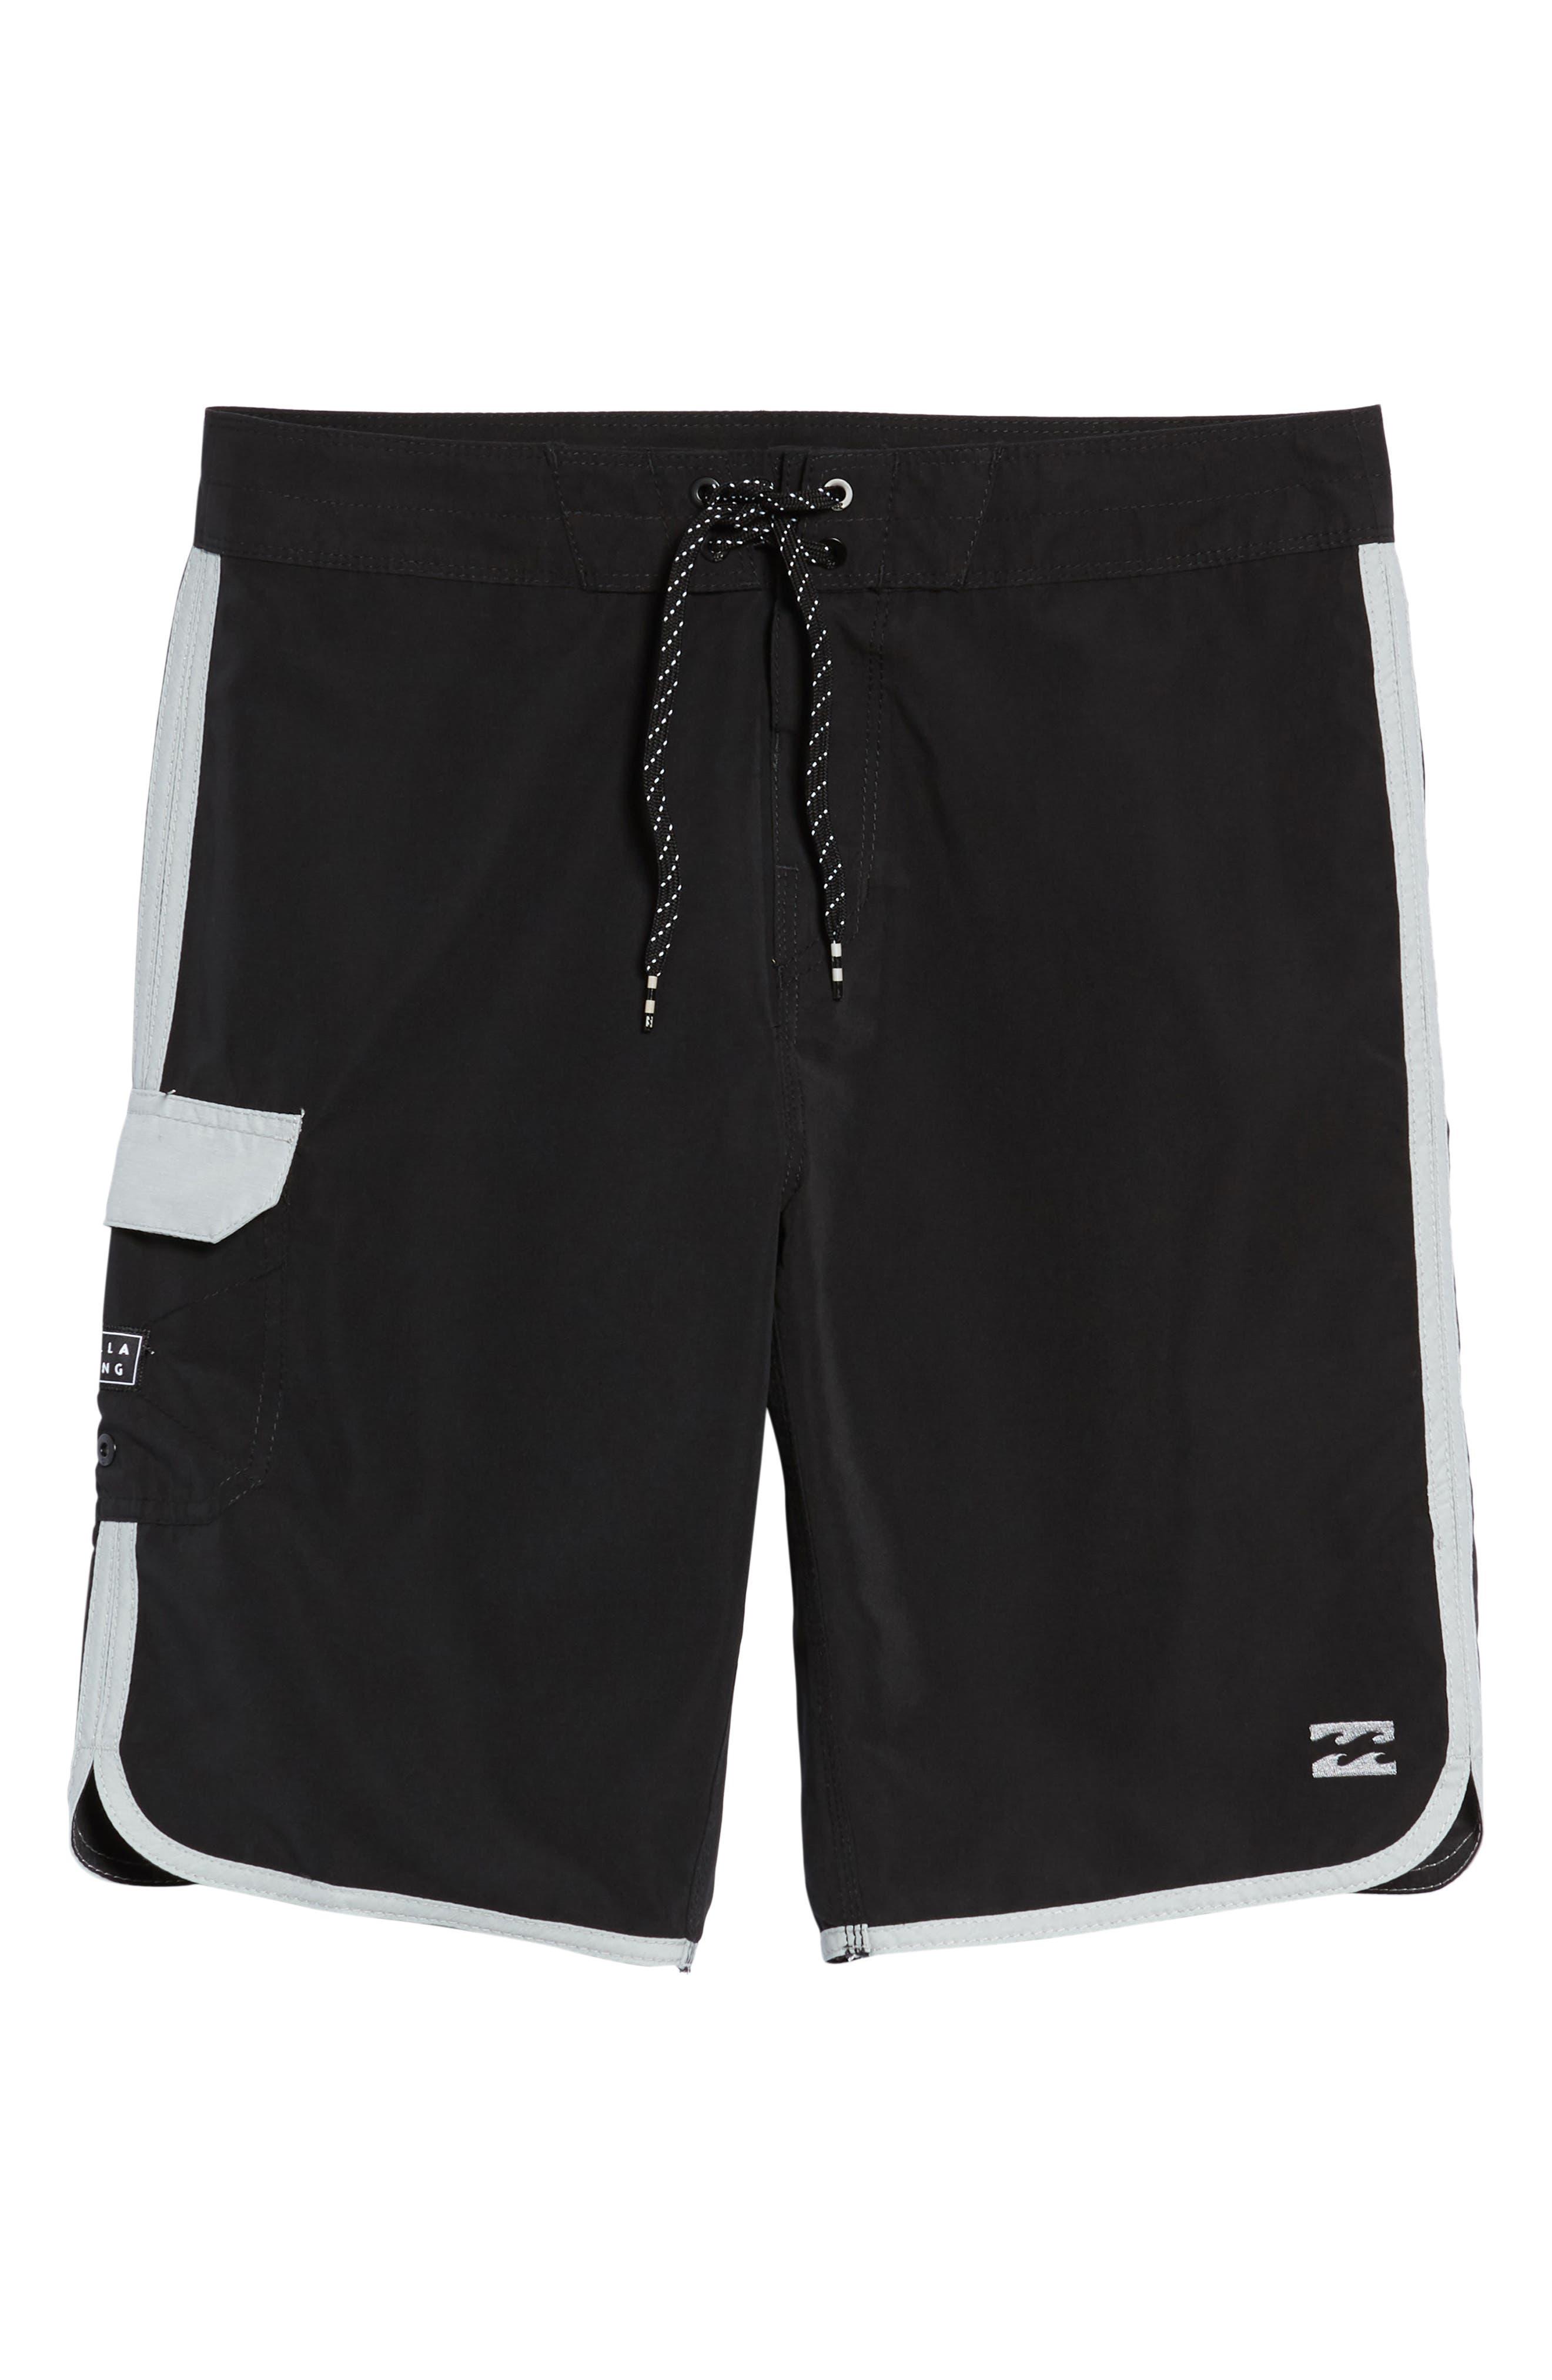 73 OG Board Shorts,                             Alternate thumbnail 6, color,                             001